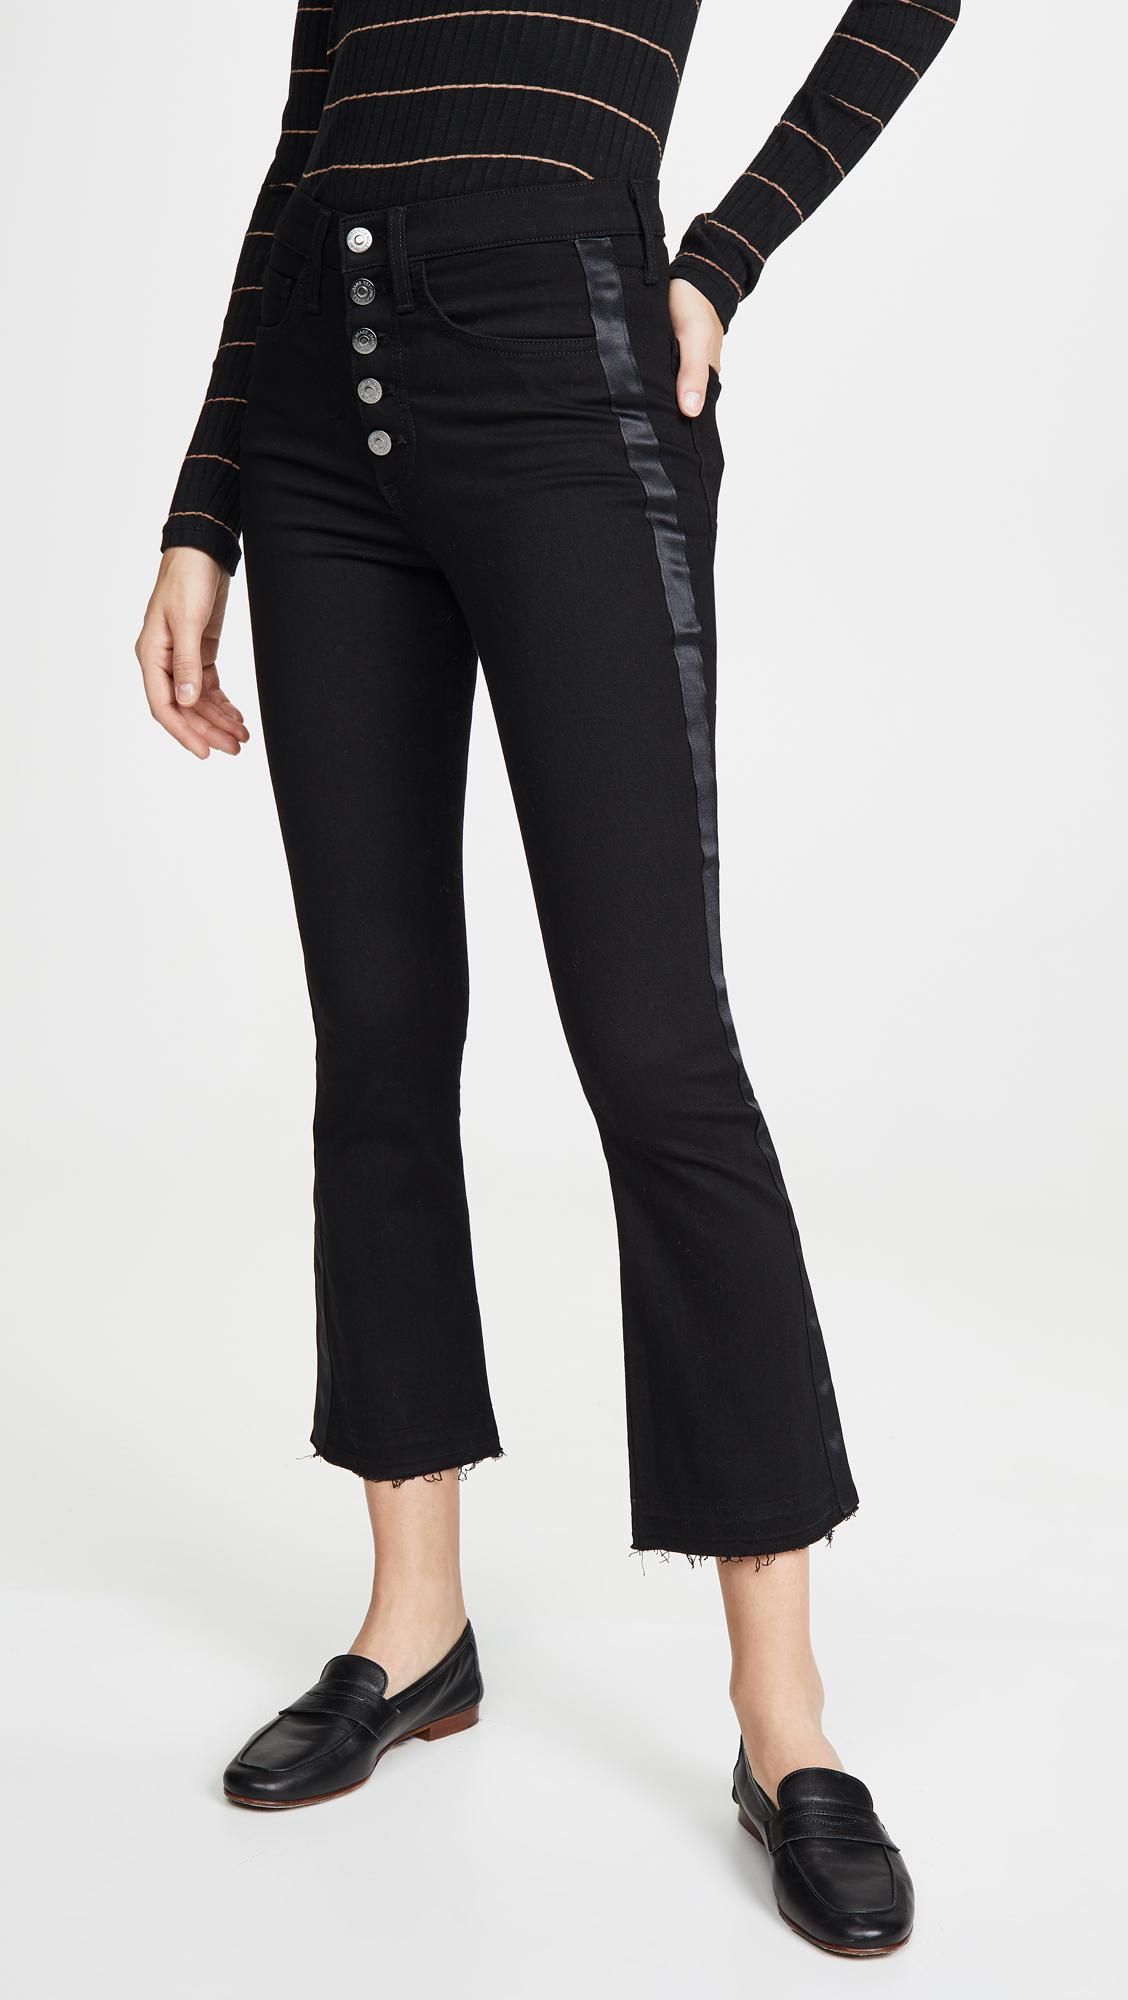 Veronica Beard Jean Carolyn Baby Boot Jeans